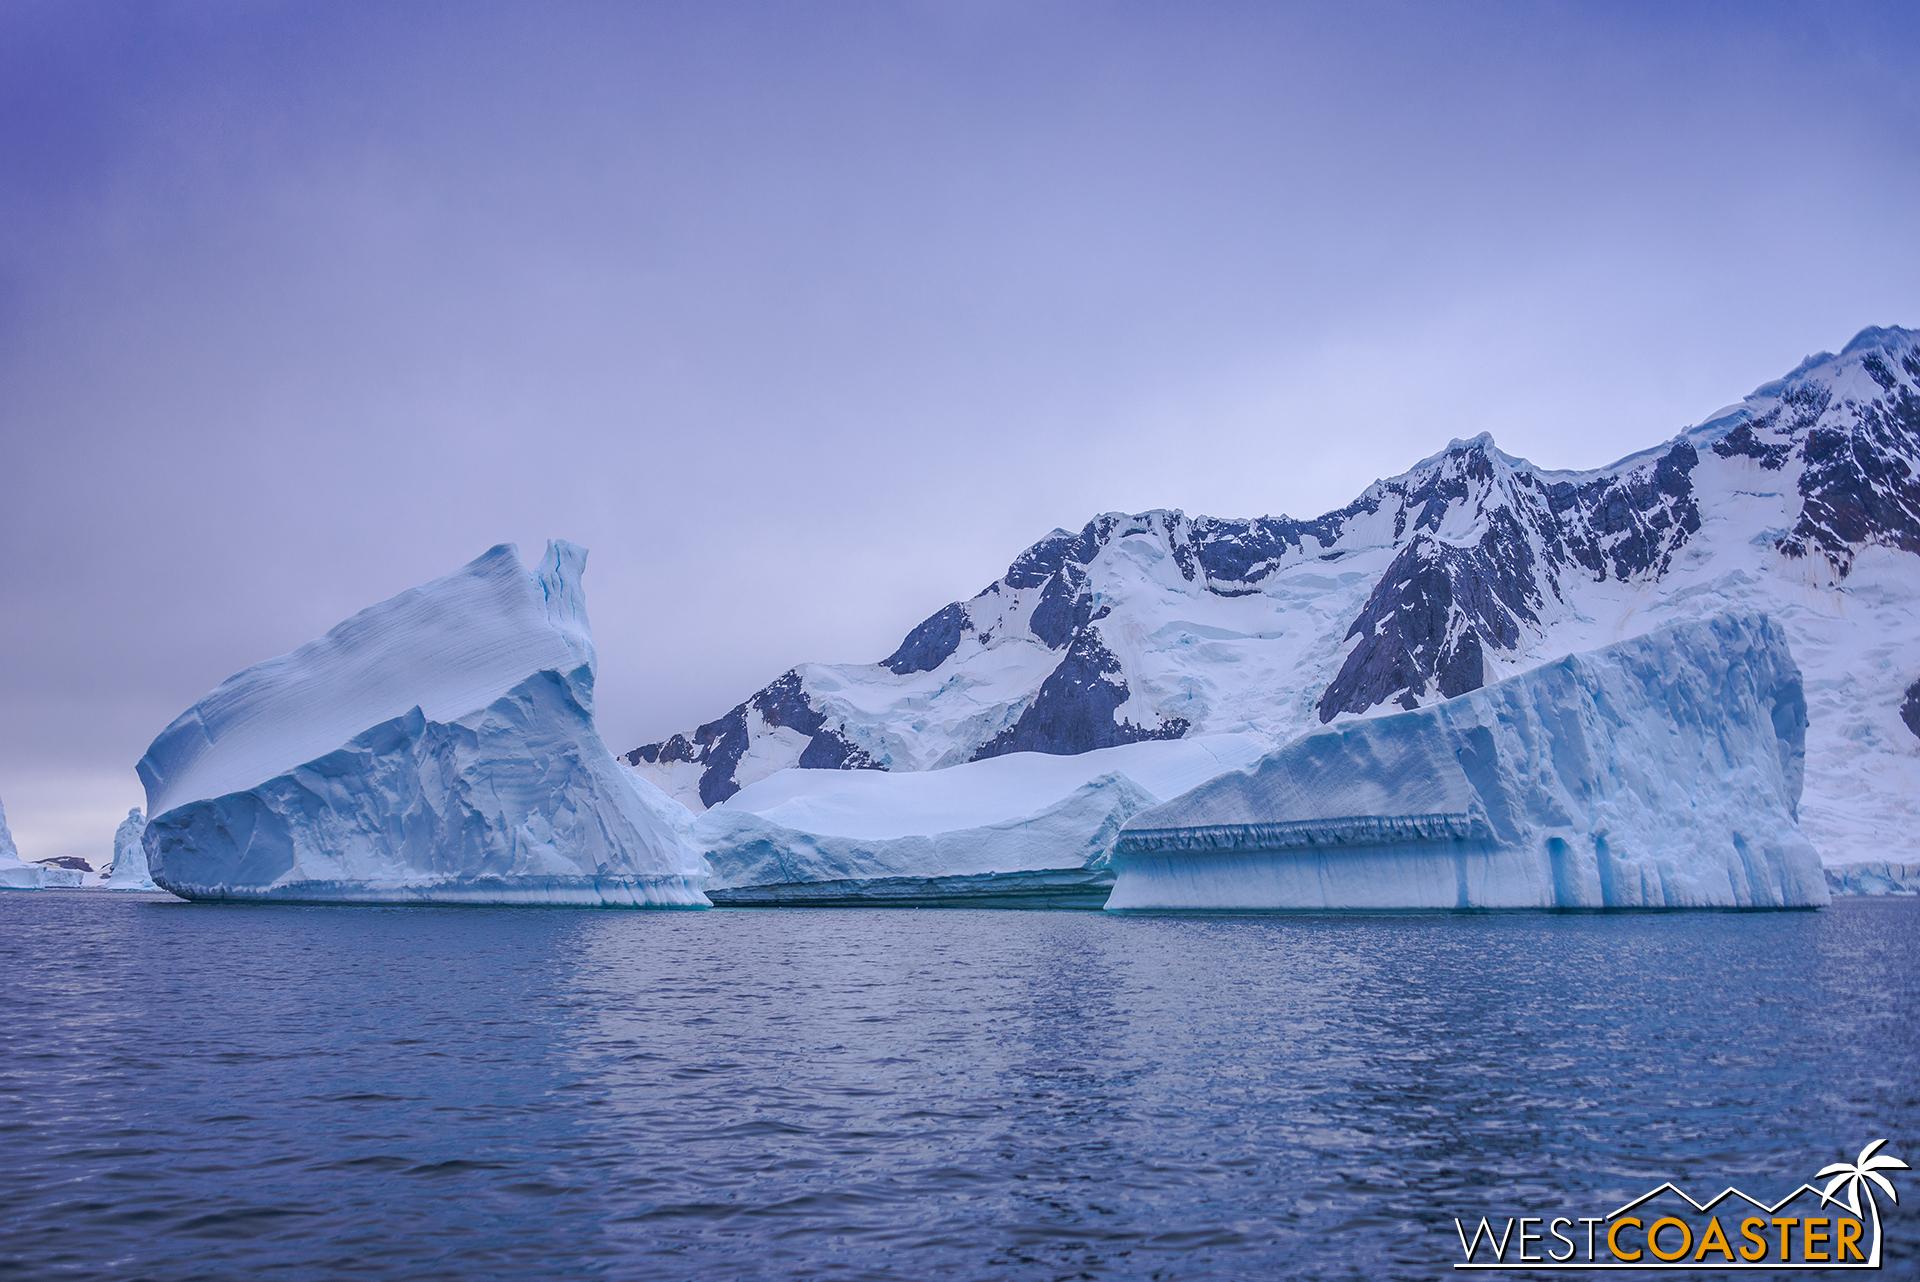 An iceberg gallery sets a moody ambiance in Pléneau Bay.